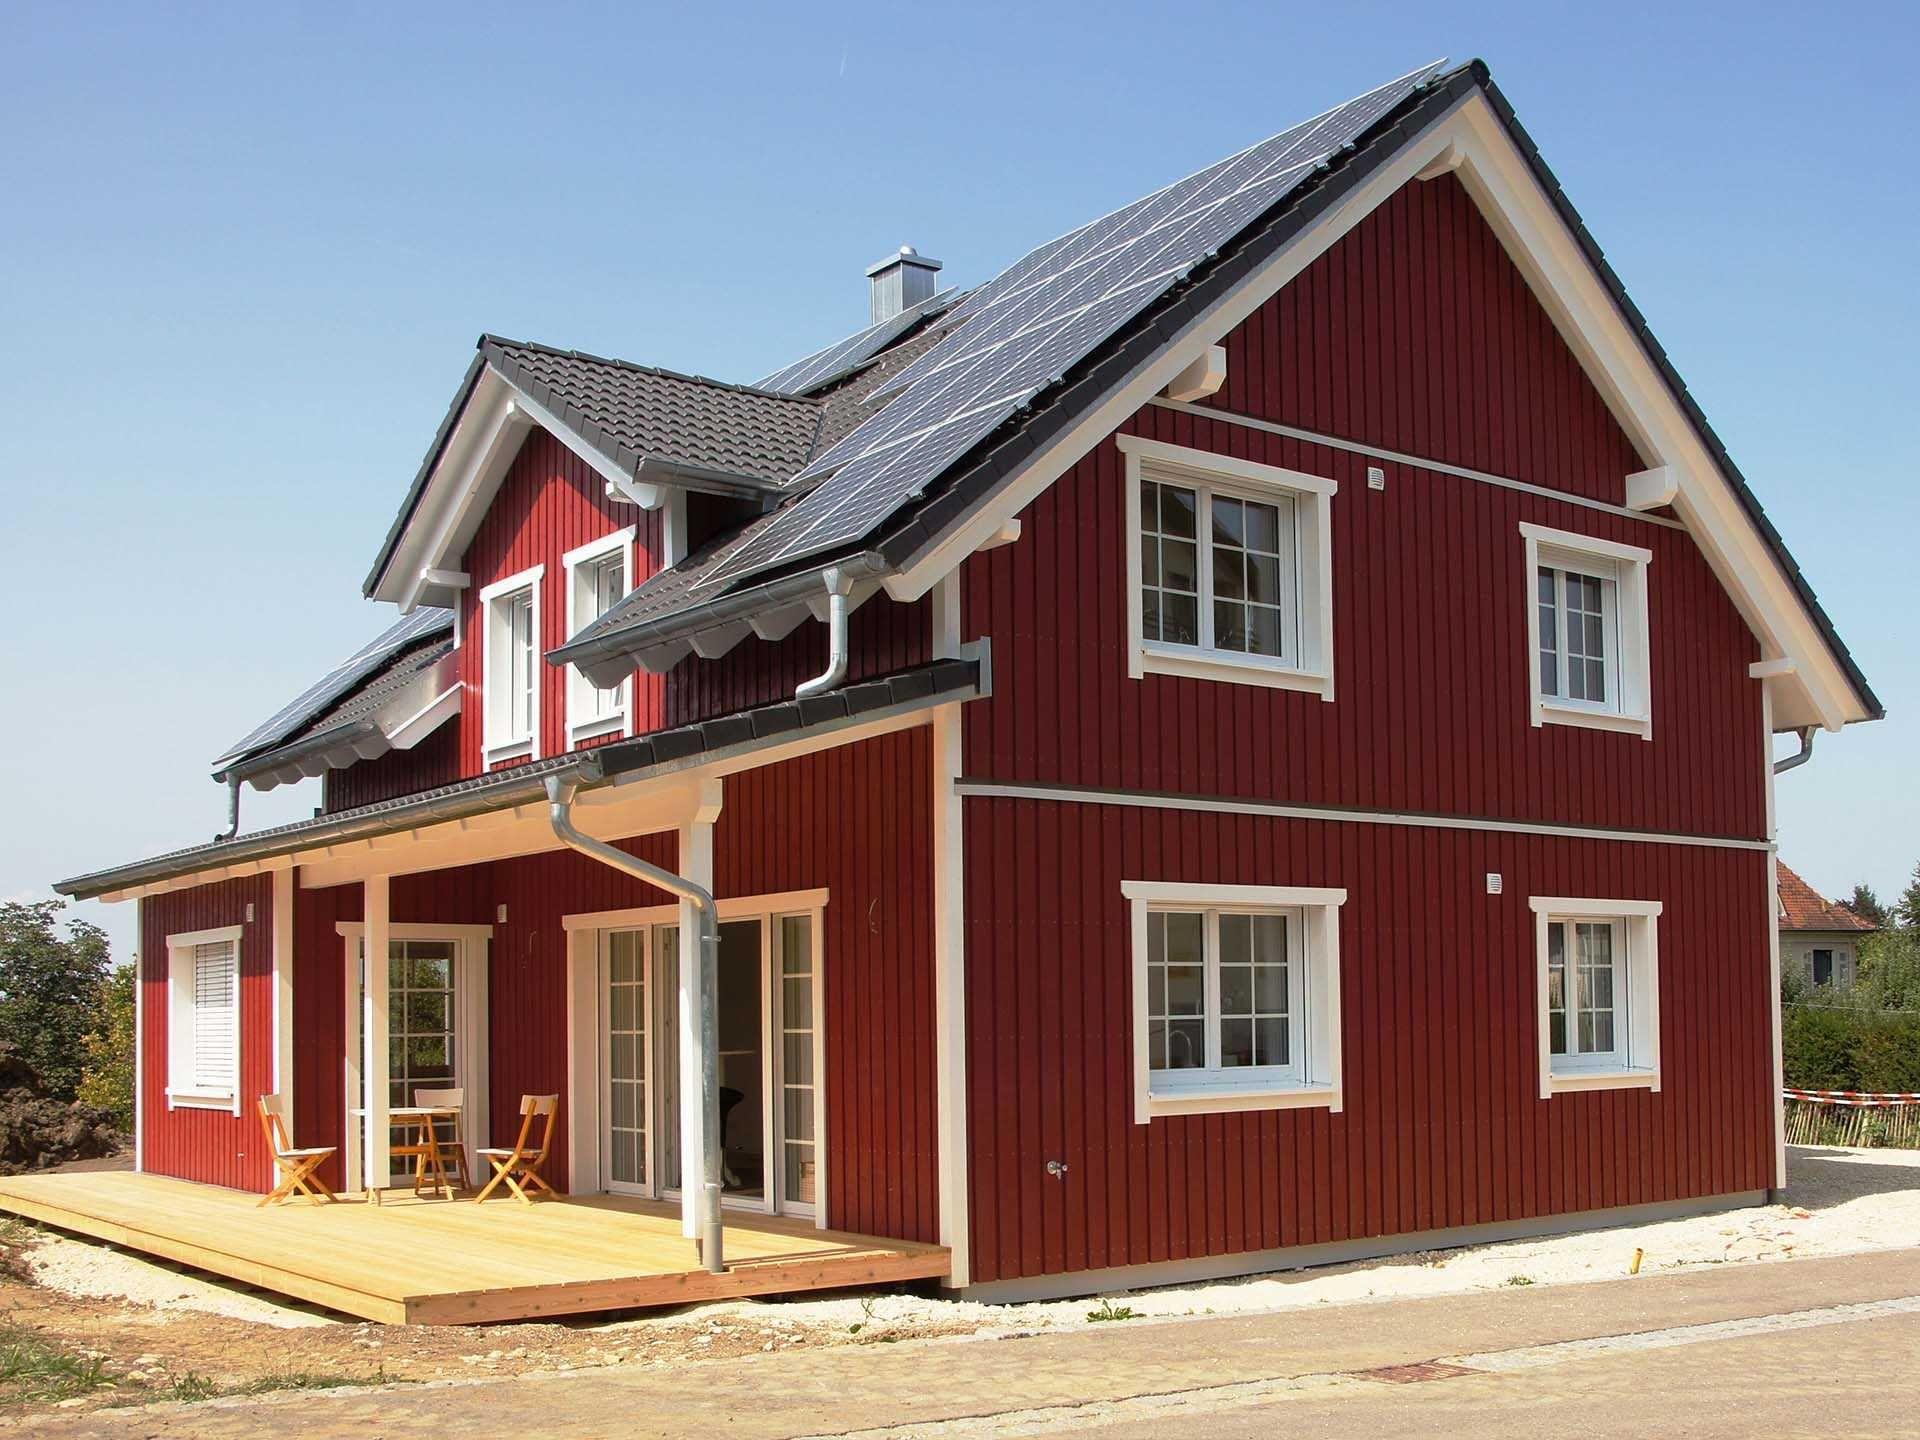 Schwedenhaus 160 Schwedenhaus, Haus und Schwedenhaus